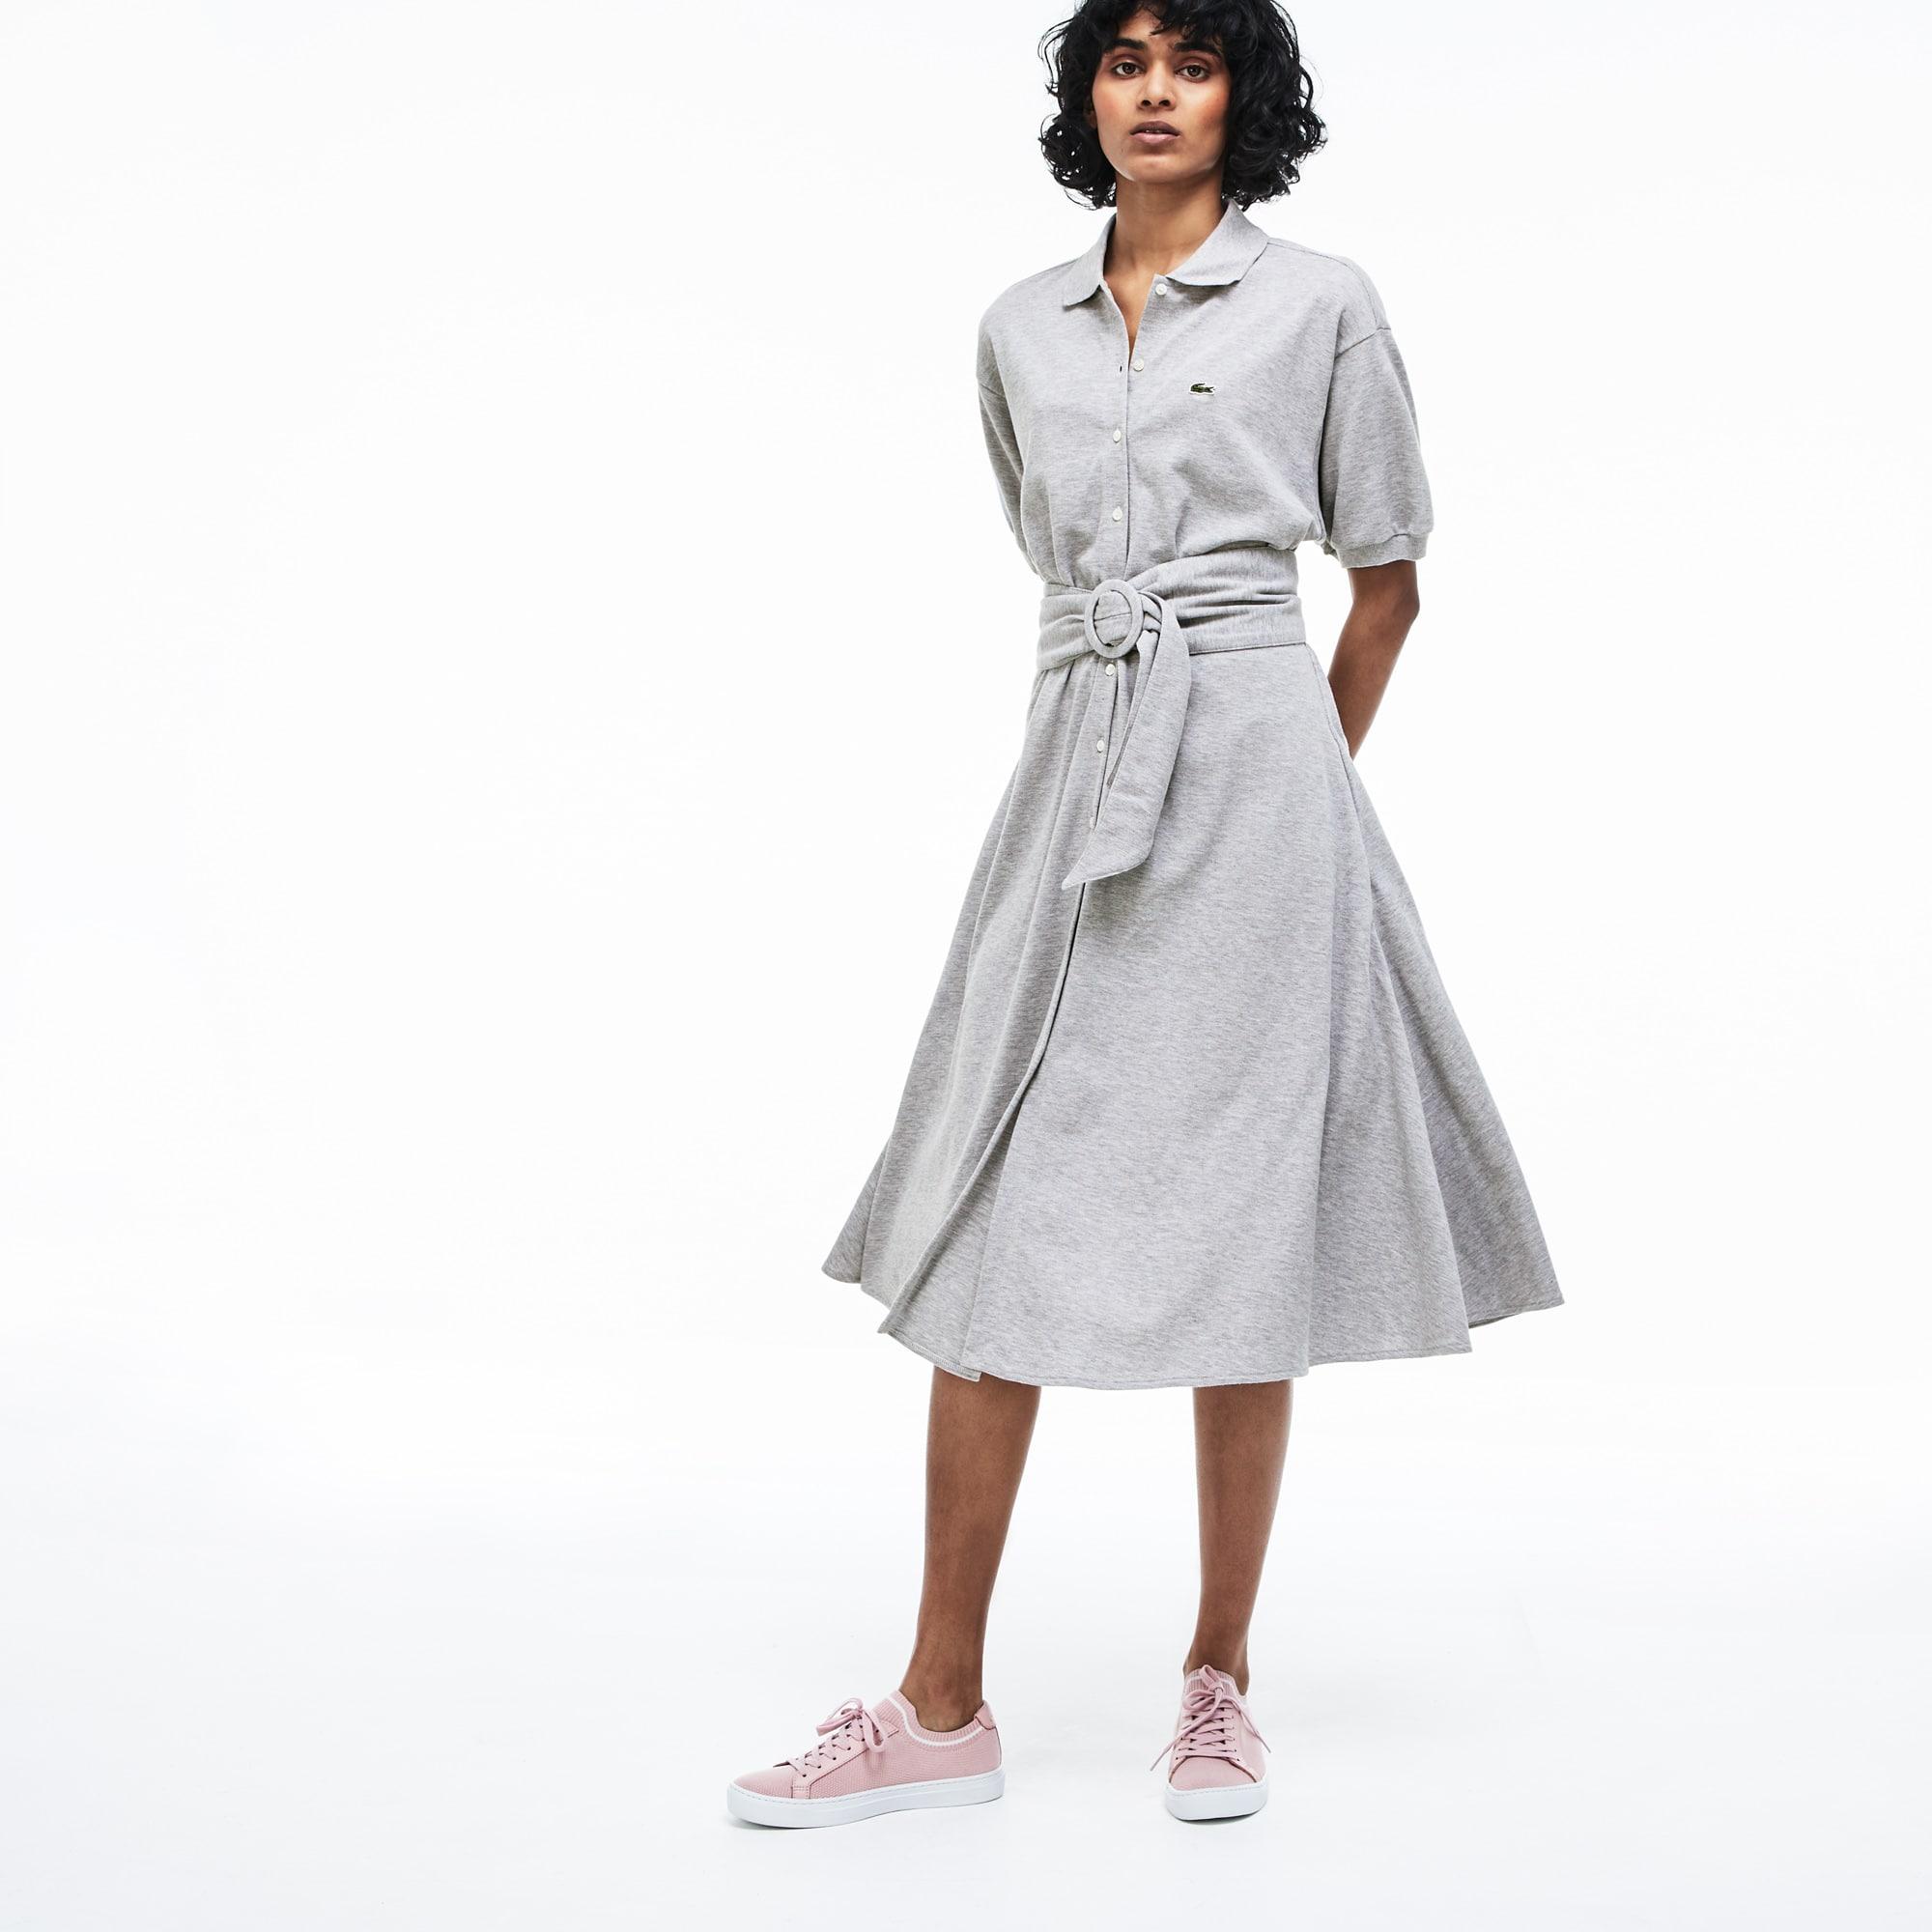 0f9ab9d1d Women s Stretch Cotton Mini Piqué Polo Dress.  155.00. Grey Chine · Navy  Blue · White · Navy Blue. + 3 colors